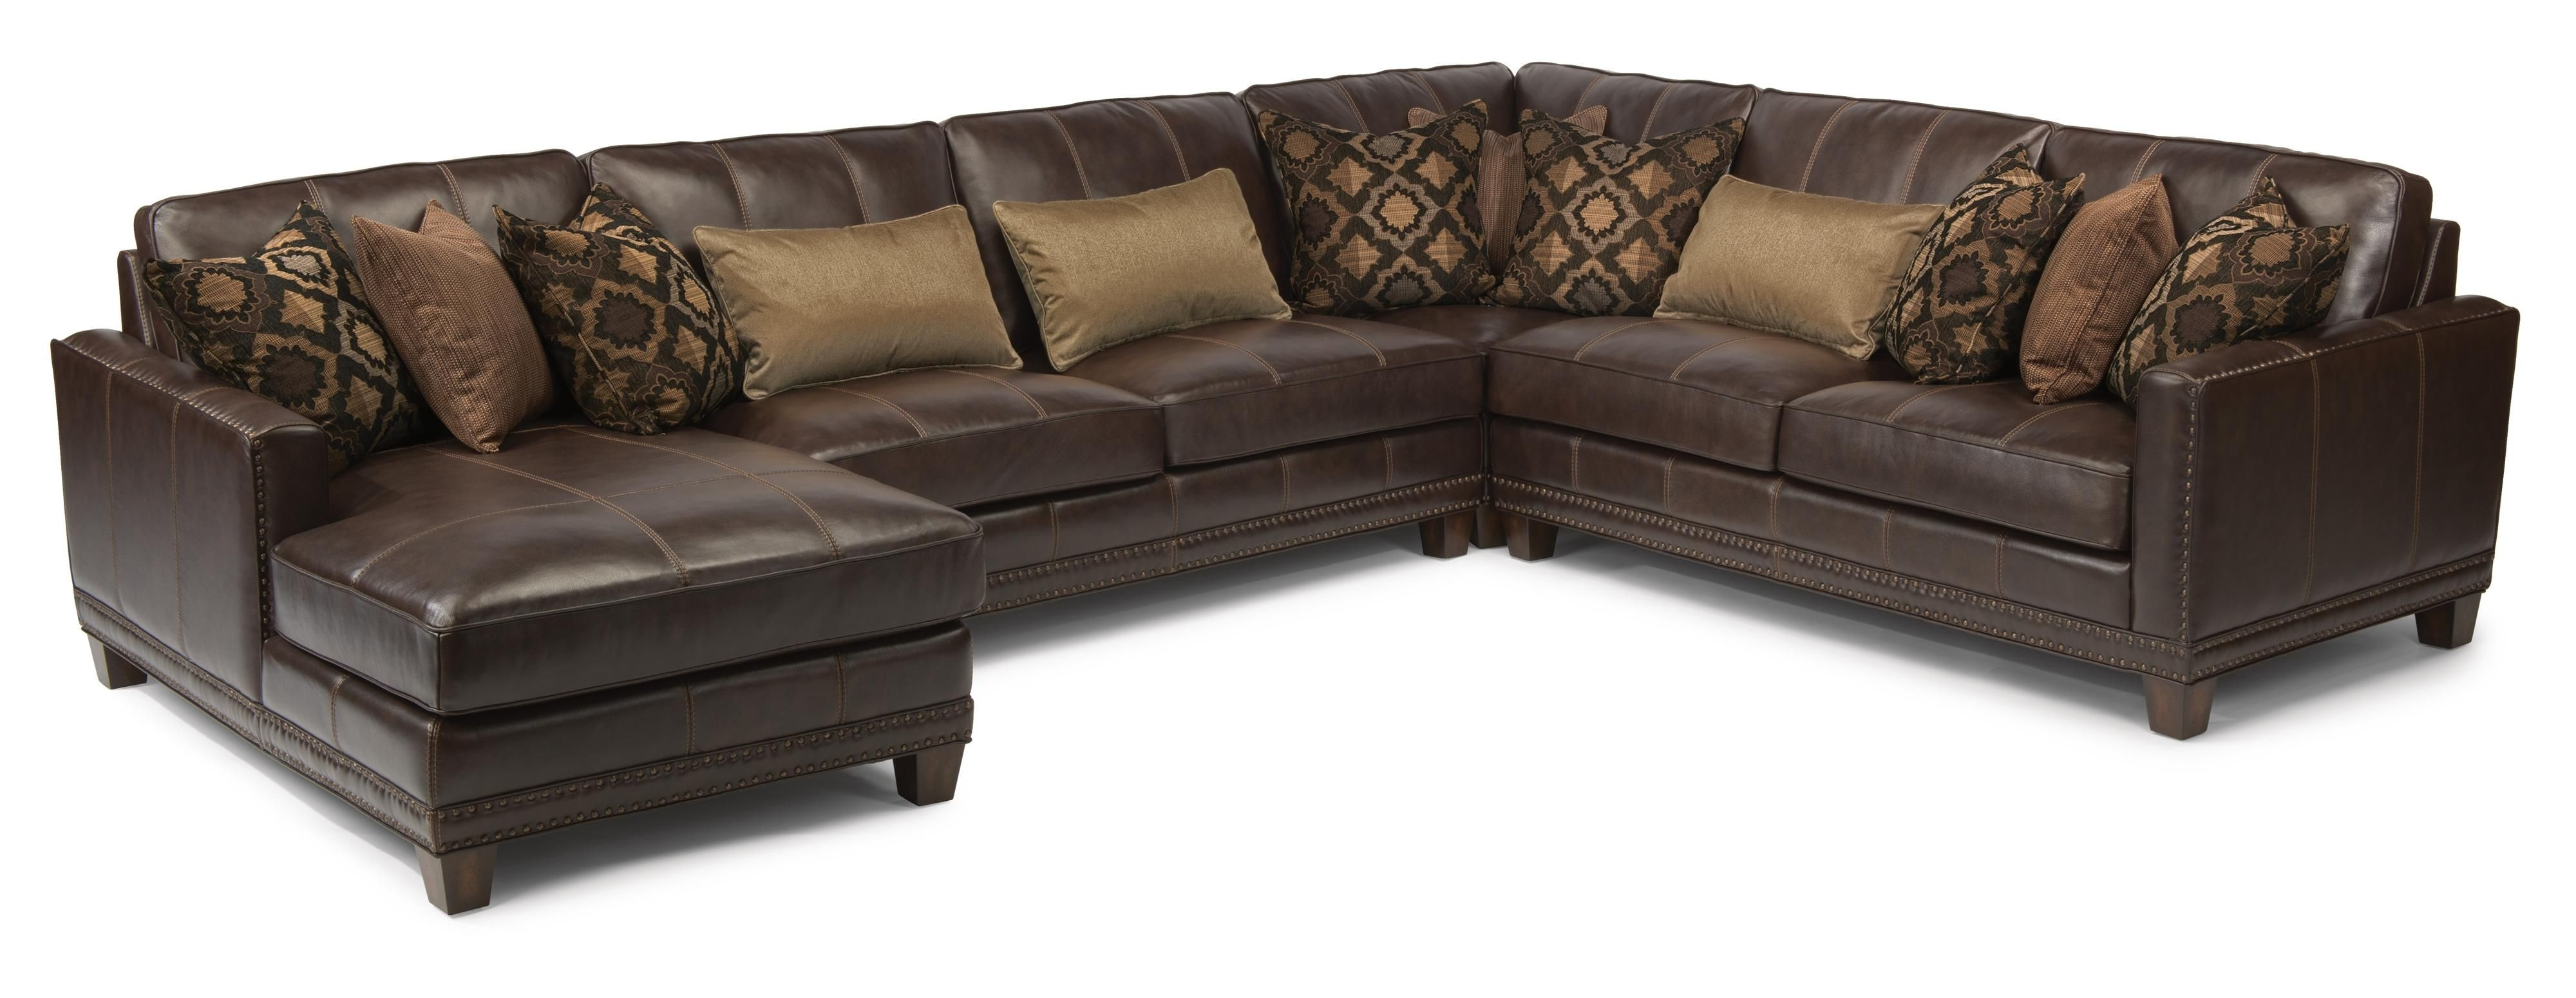 Latitudes – Port Royal Transitional Four Piece Sectional Sofa With Regarding Nova Scotia Sectional Sofas (Image 4 of 10)